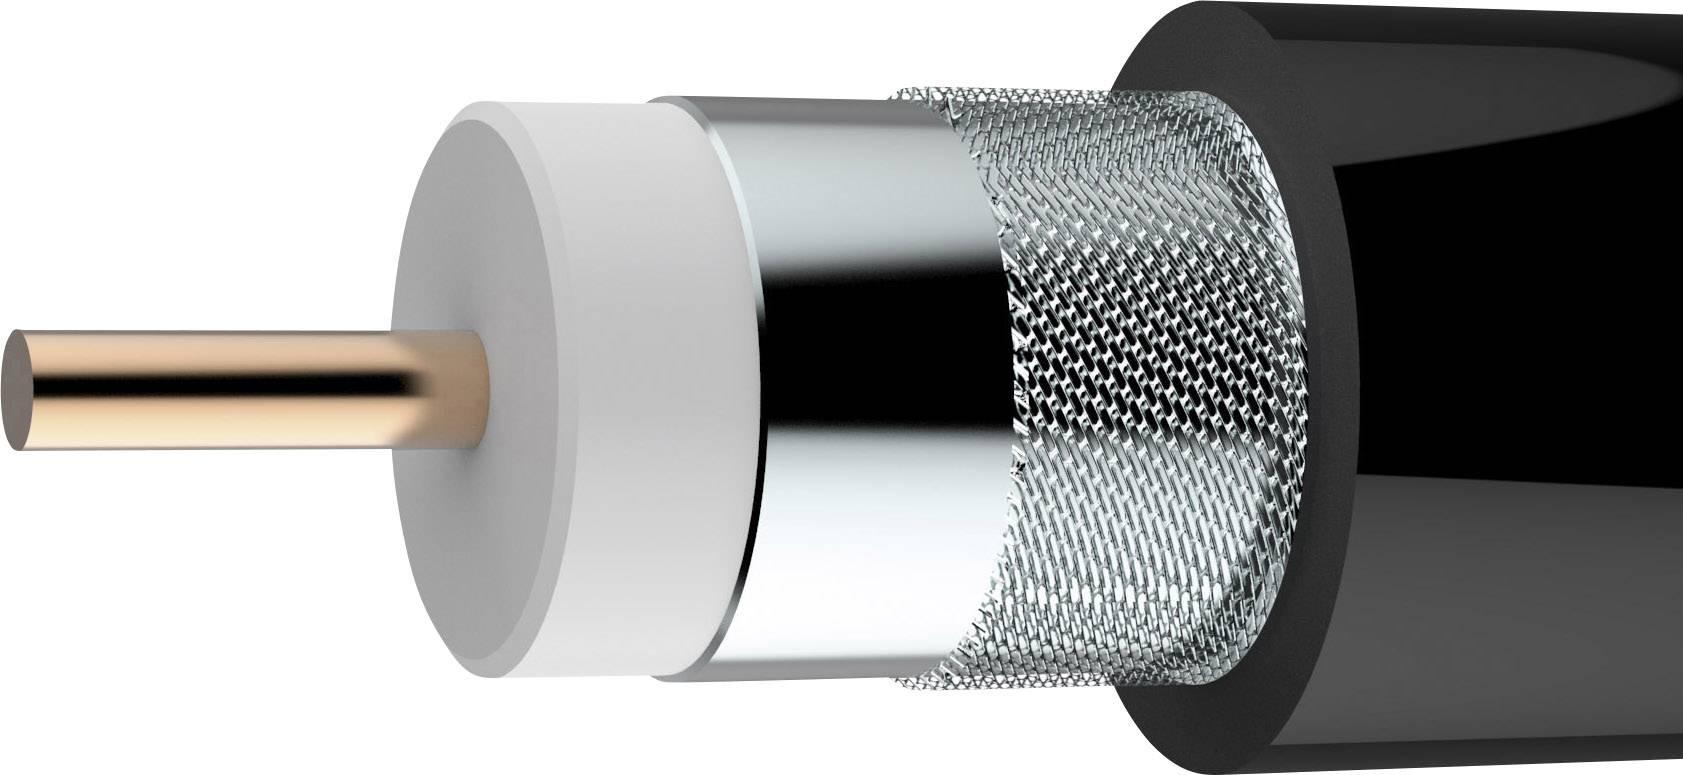 Koaxiálny kábel Axing SKB 11-03, 75 Ohm, metrový tovar, čierna